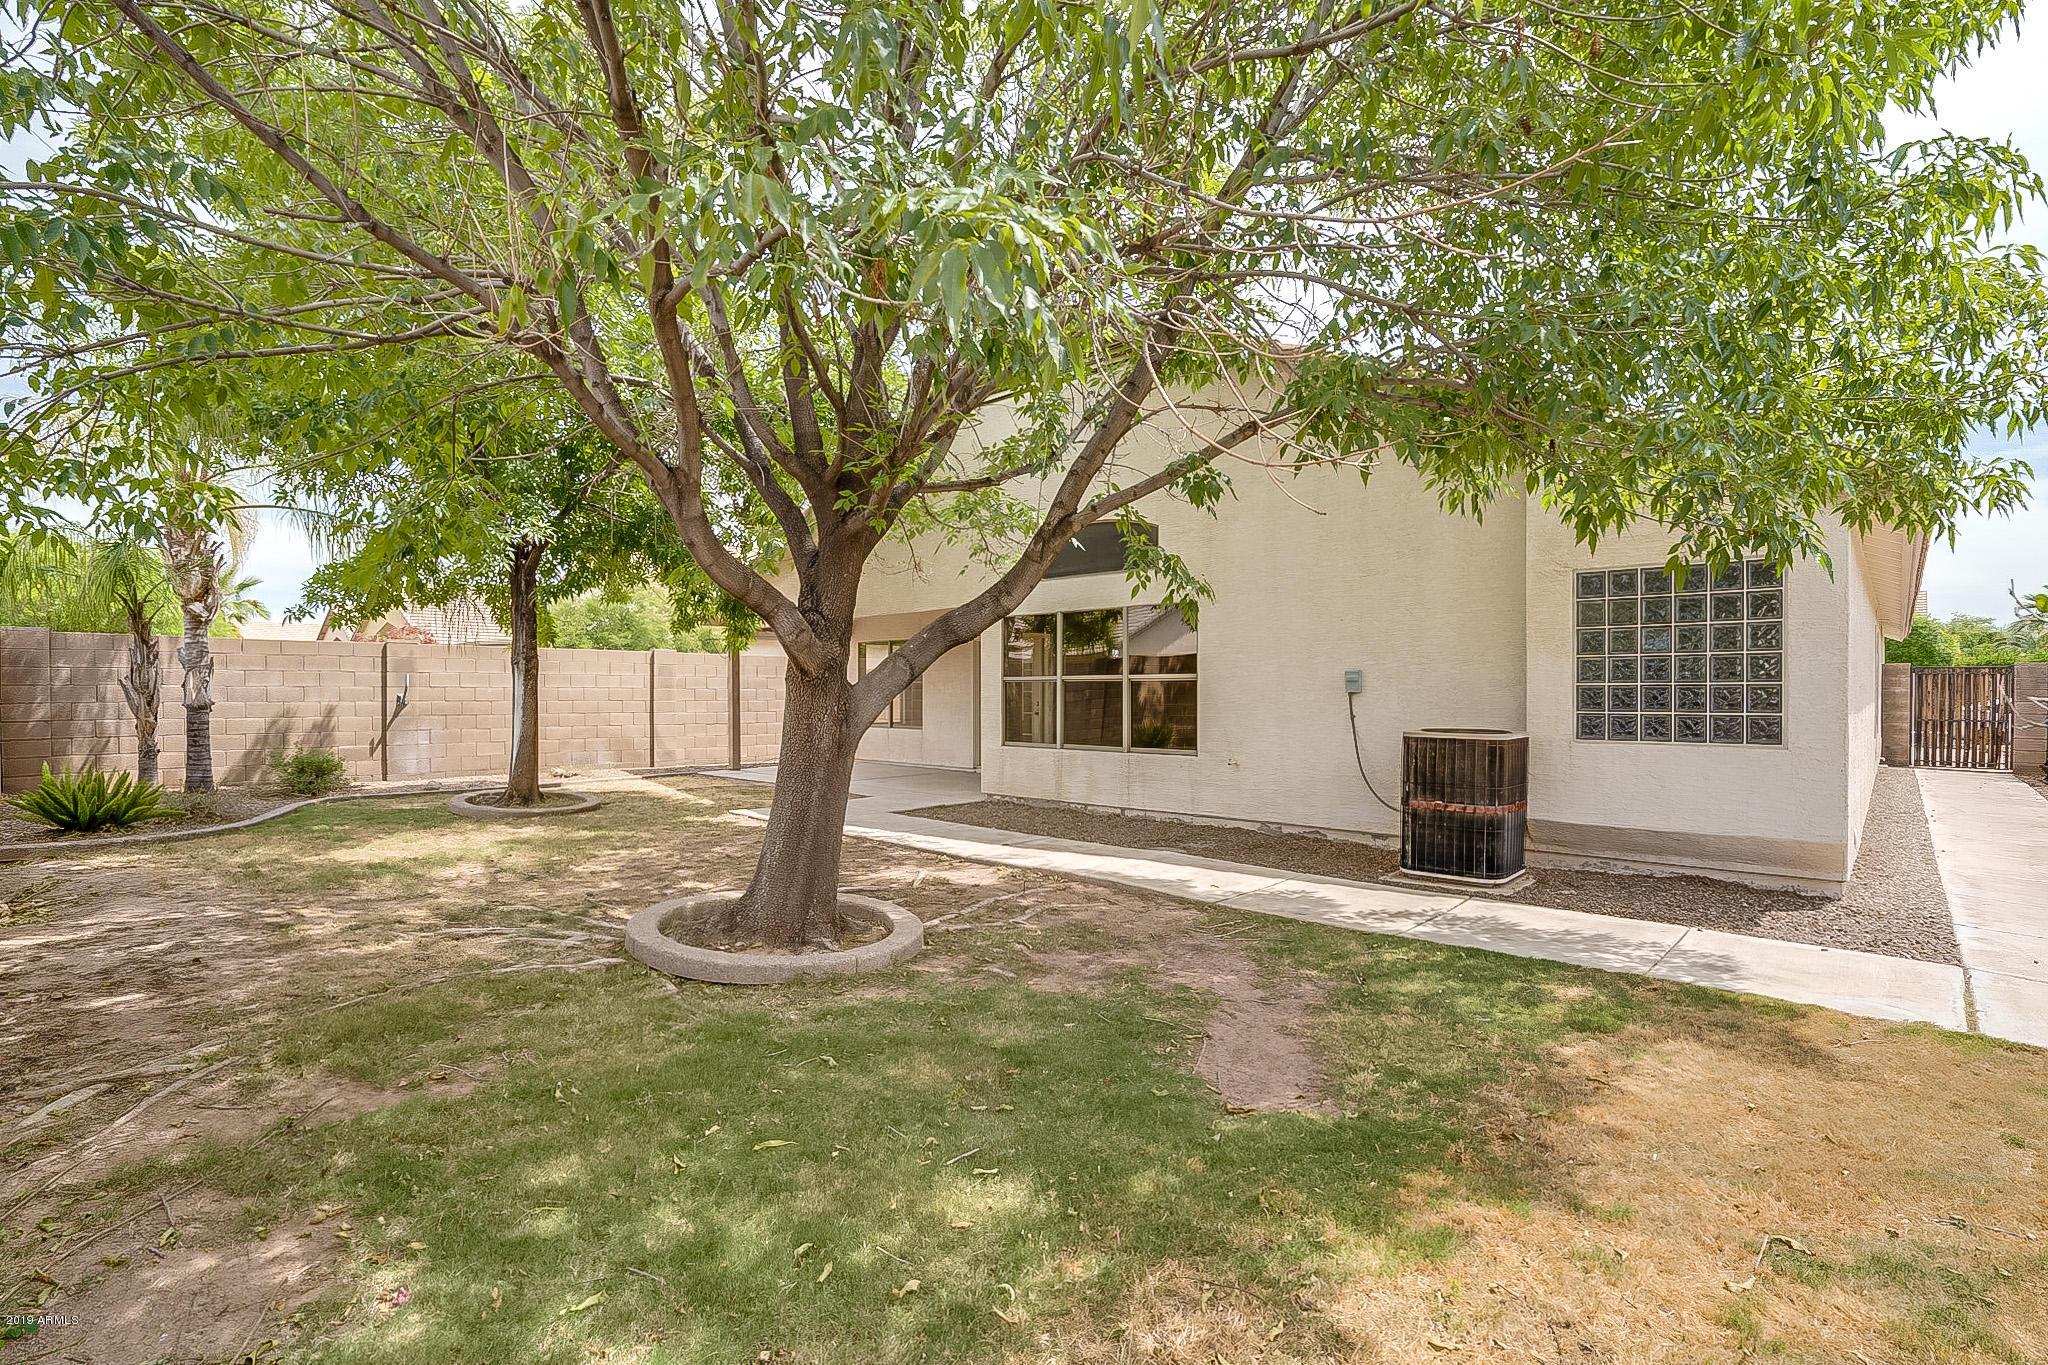 MLS 5920164 2860 S 94TH Street, Mesa, AZ 85212 Mesa AZ Mesquite Canyon